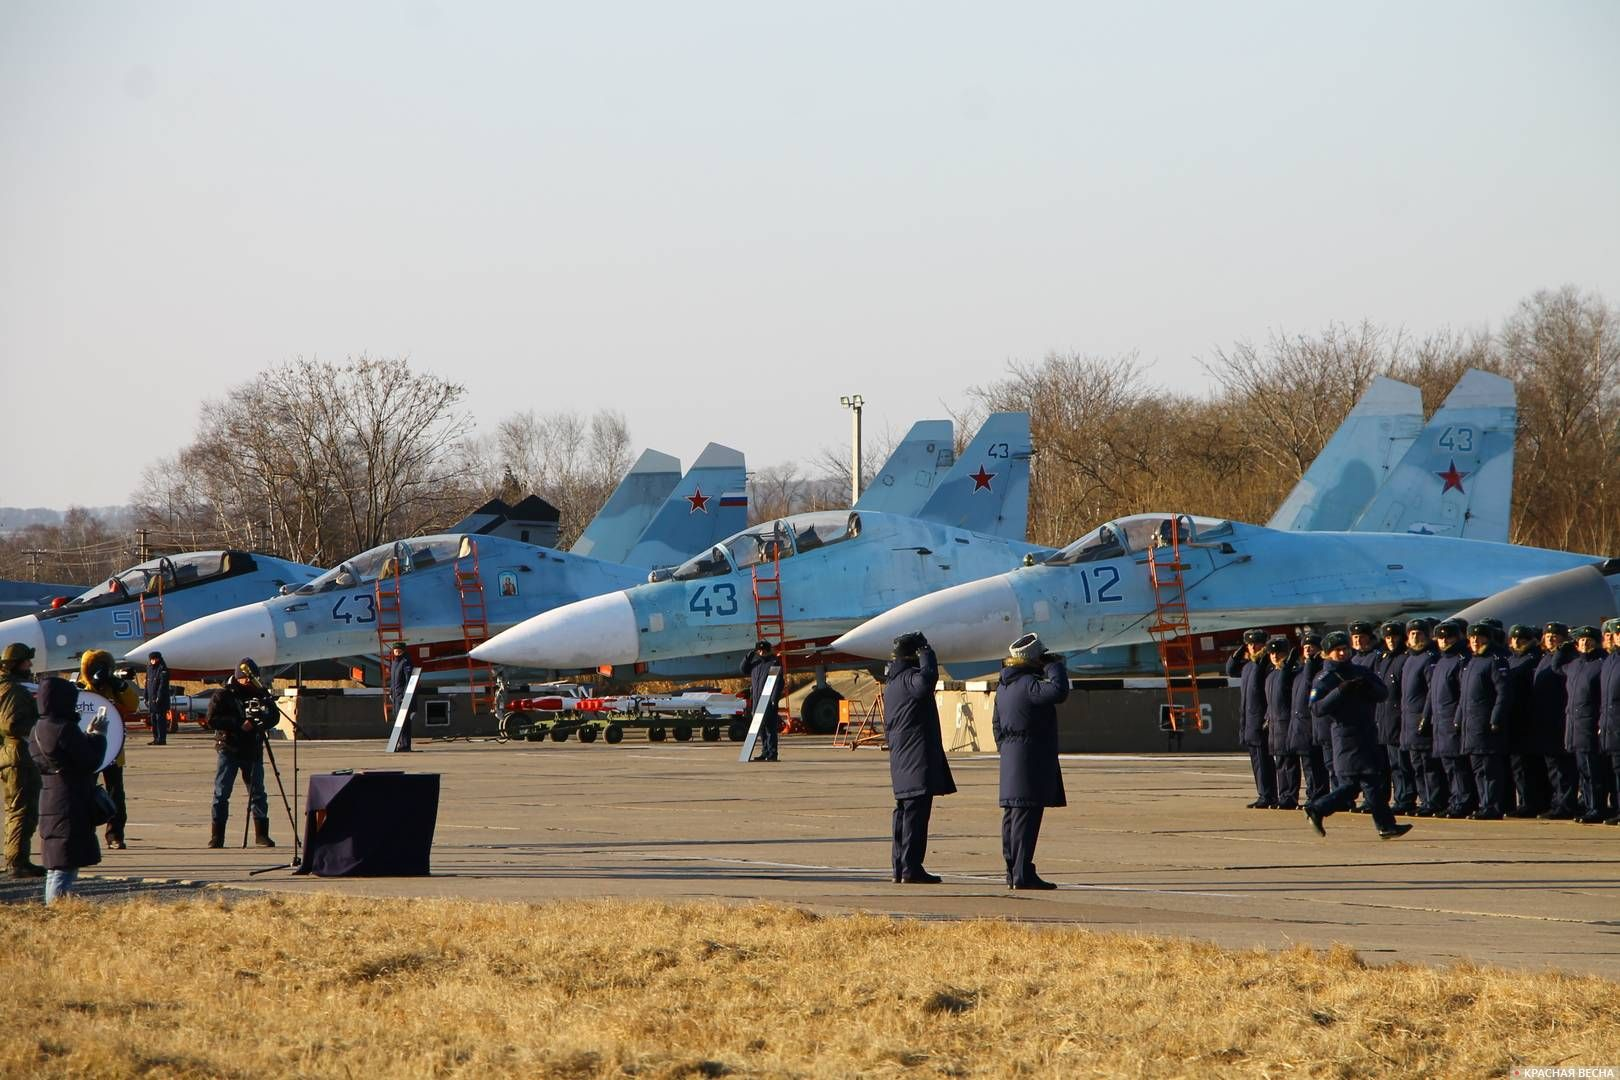 Авиабаза Центральная Угловая. Приморский край